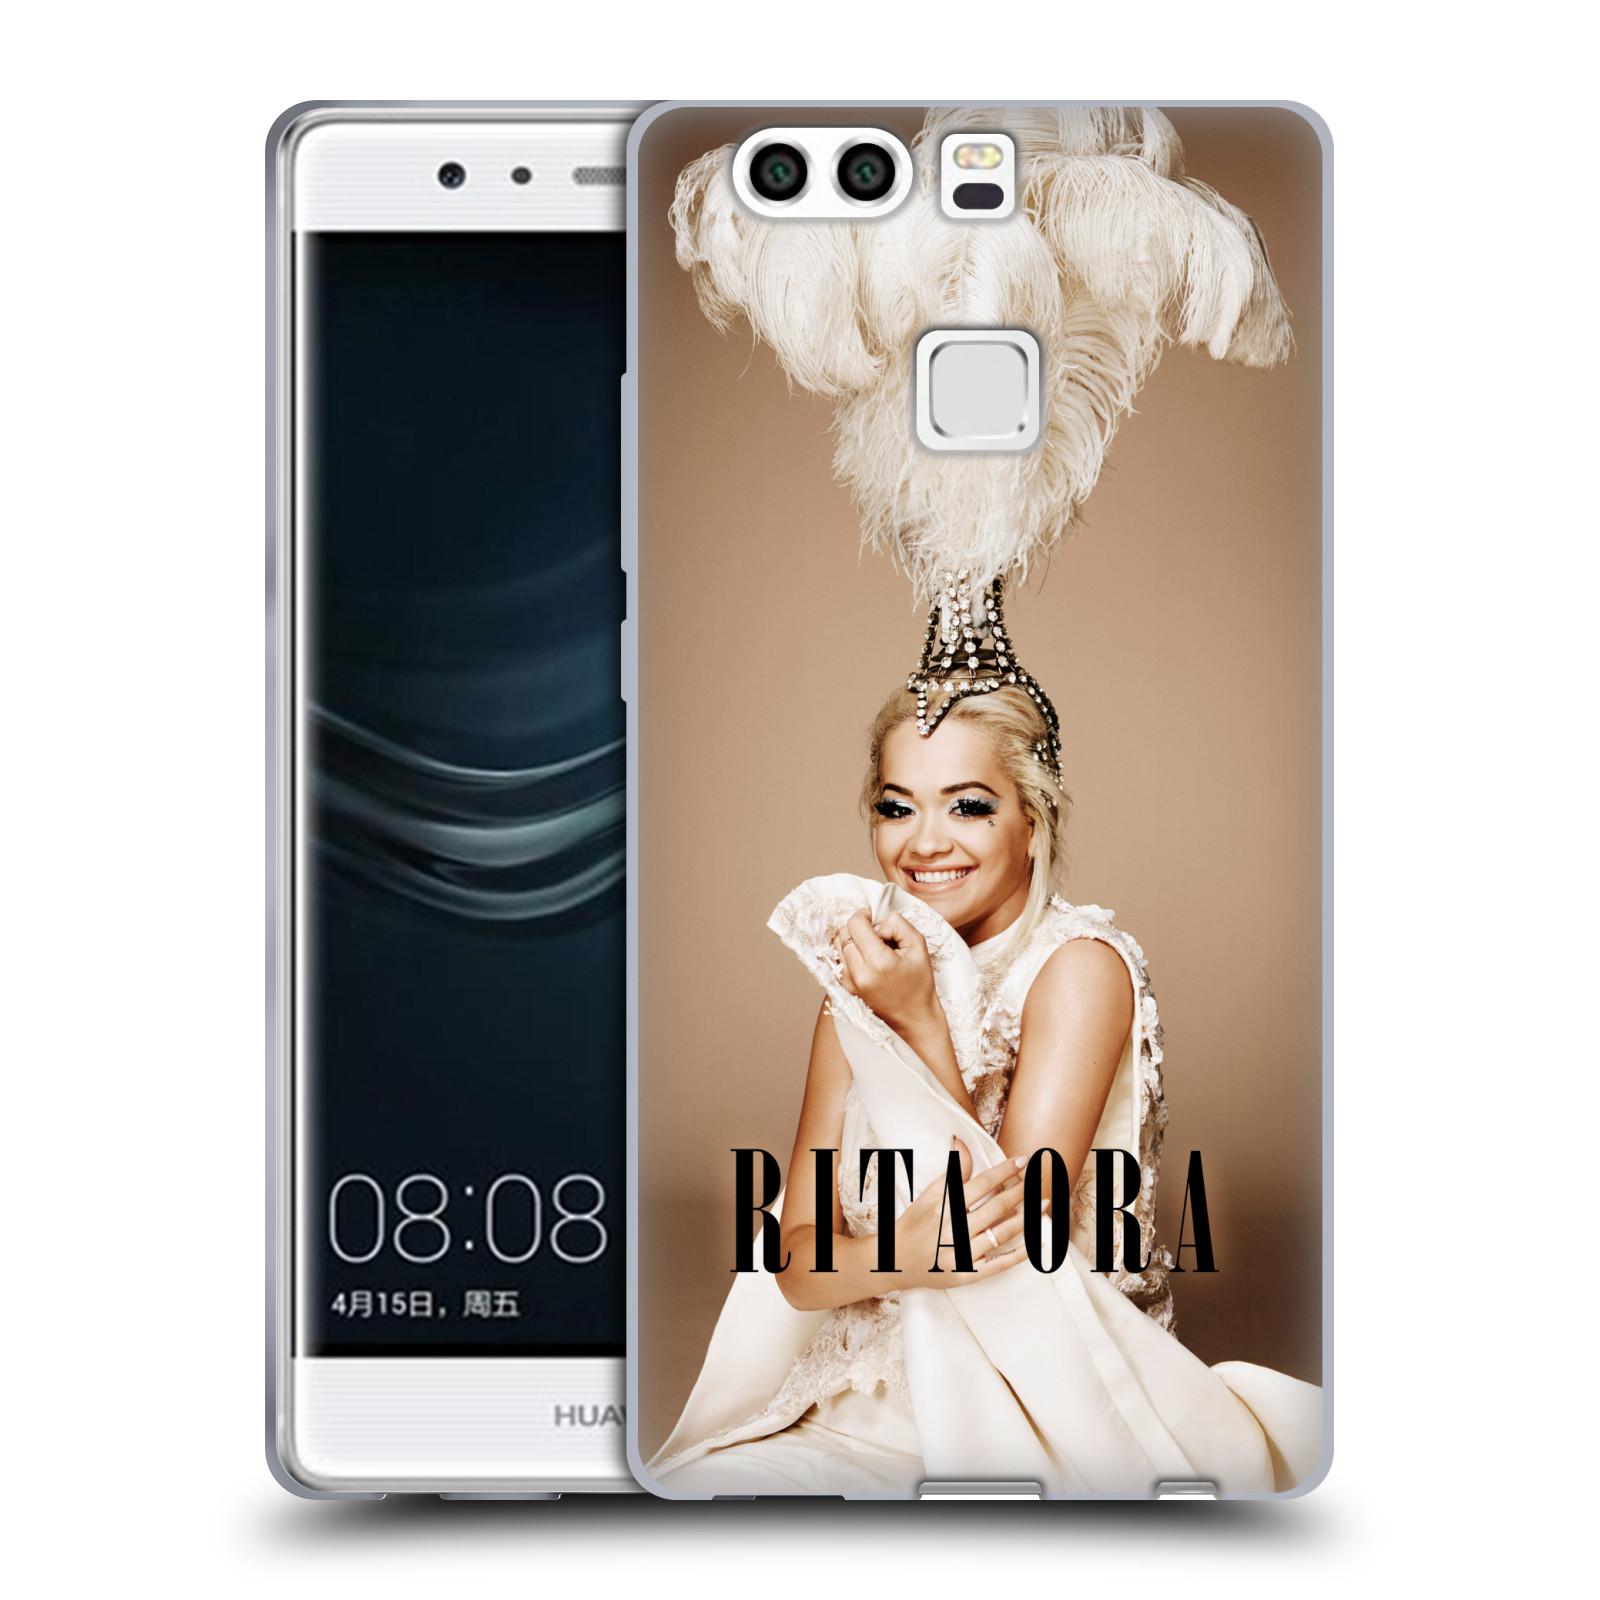 HEAD CASE silikonový obal na mobil Huawei P9 PLUS / P9 PLUS DUAL SIM zpěvačka Rita Ora peří